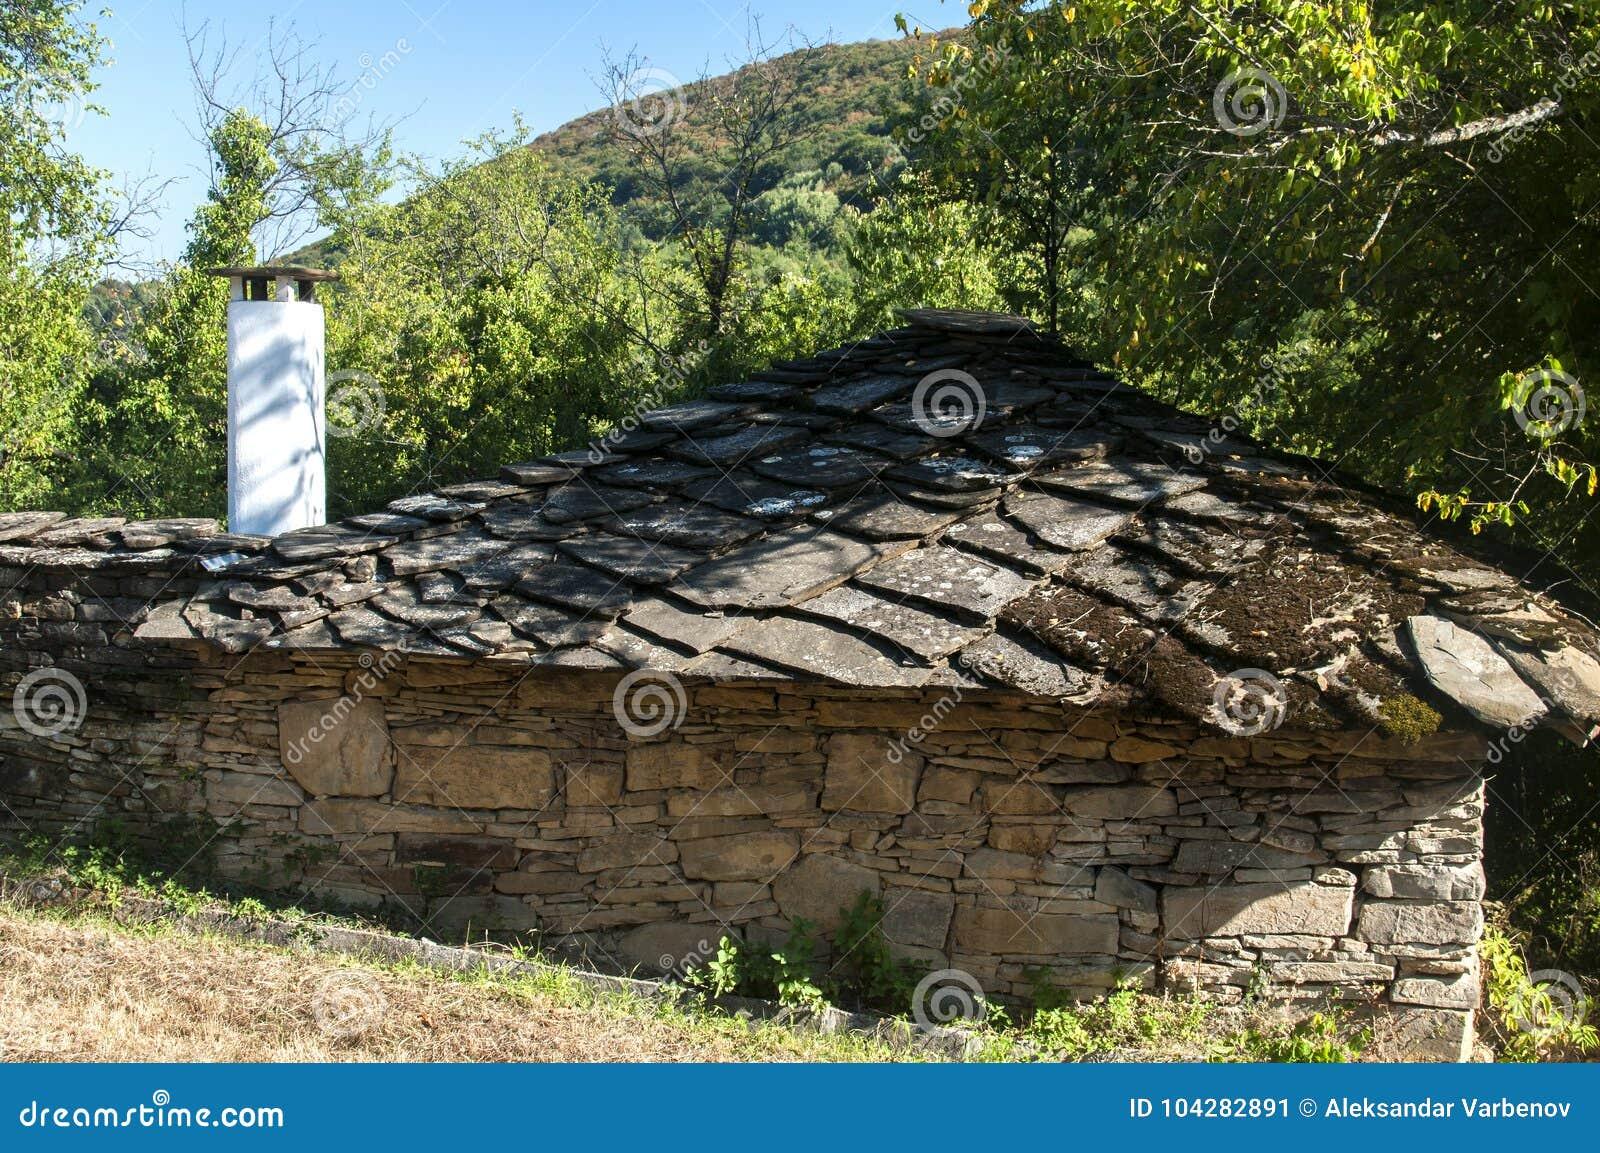 Vecchia Casa Di Campagna Di Pietra Immagine Stock Immagine Di